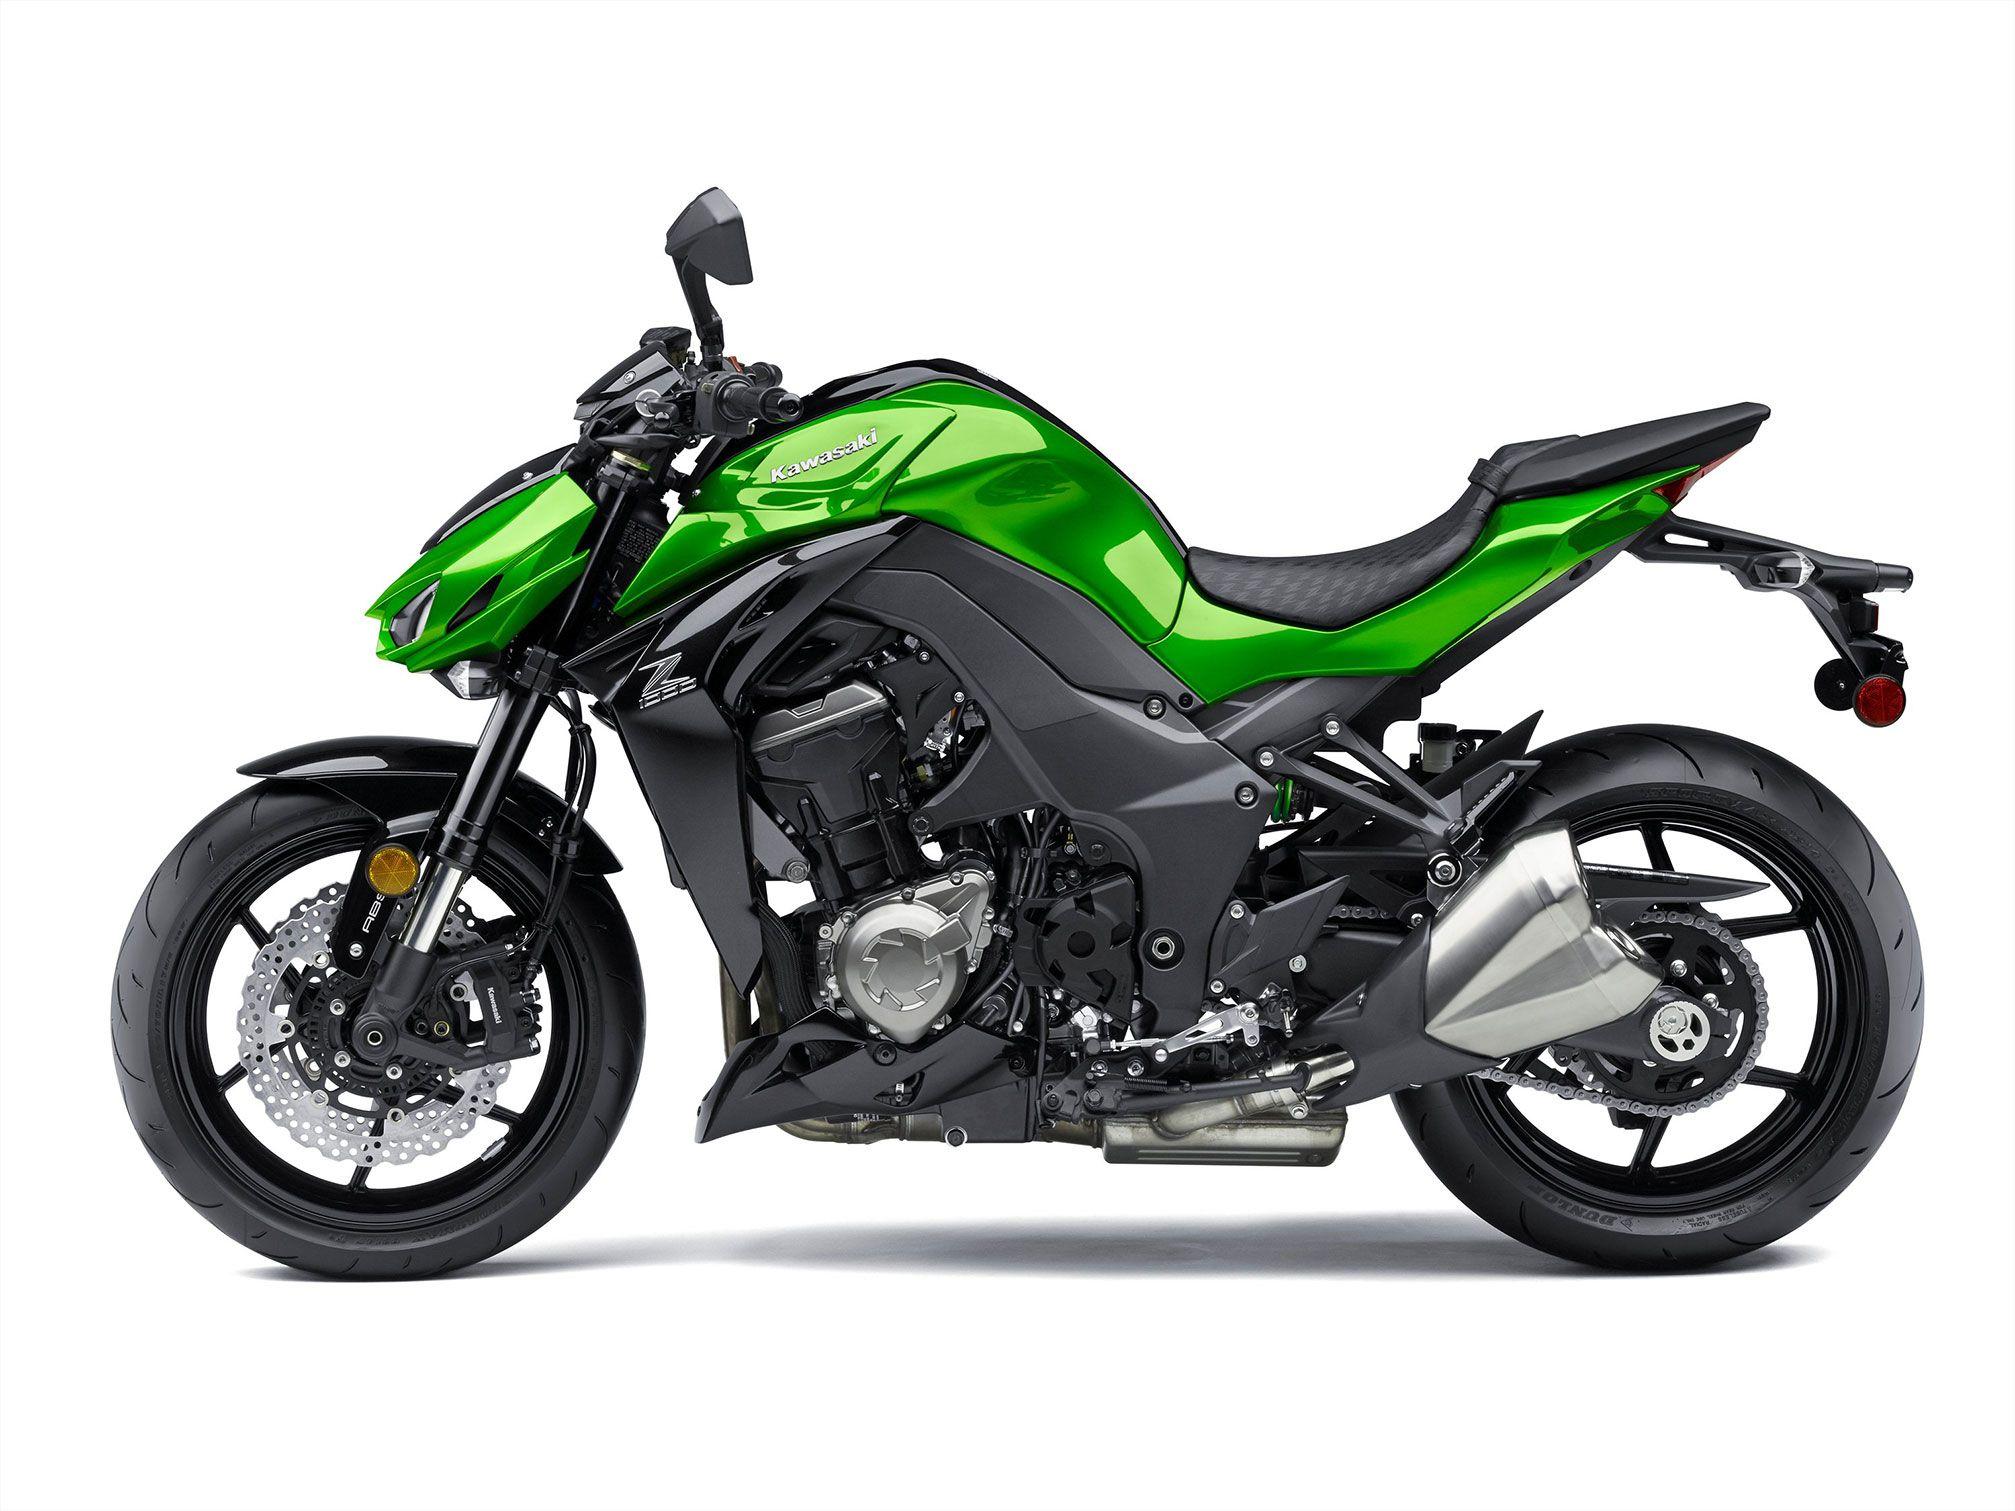 2015 Kawasaki Z1000 Abs Kawasaki Z1000 Kawasaki Motor Kawasaki